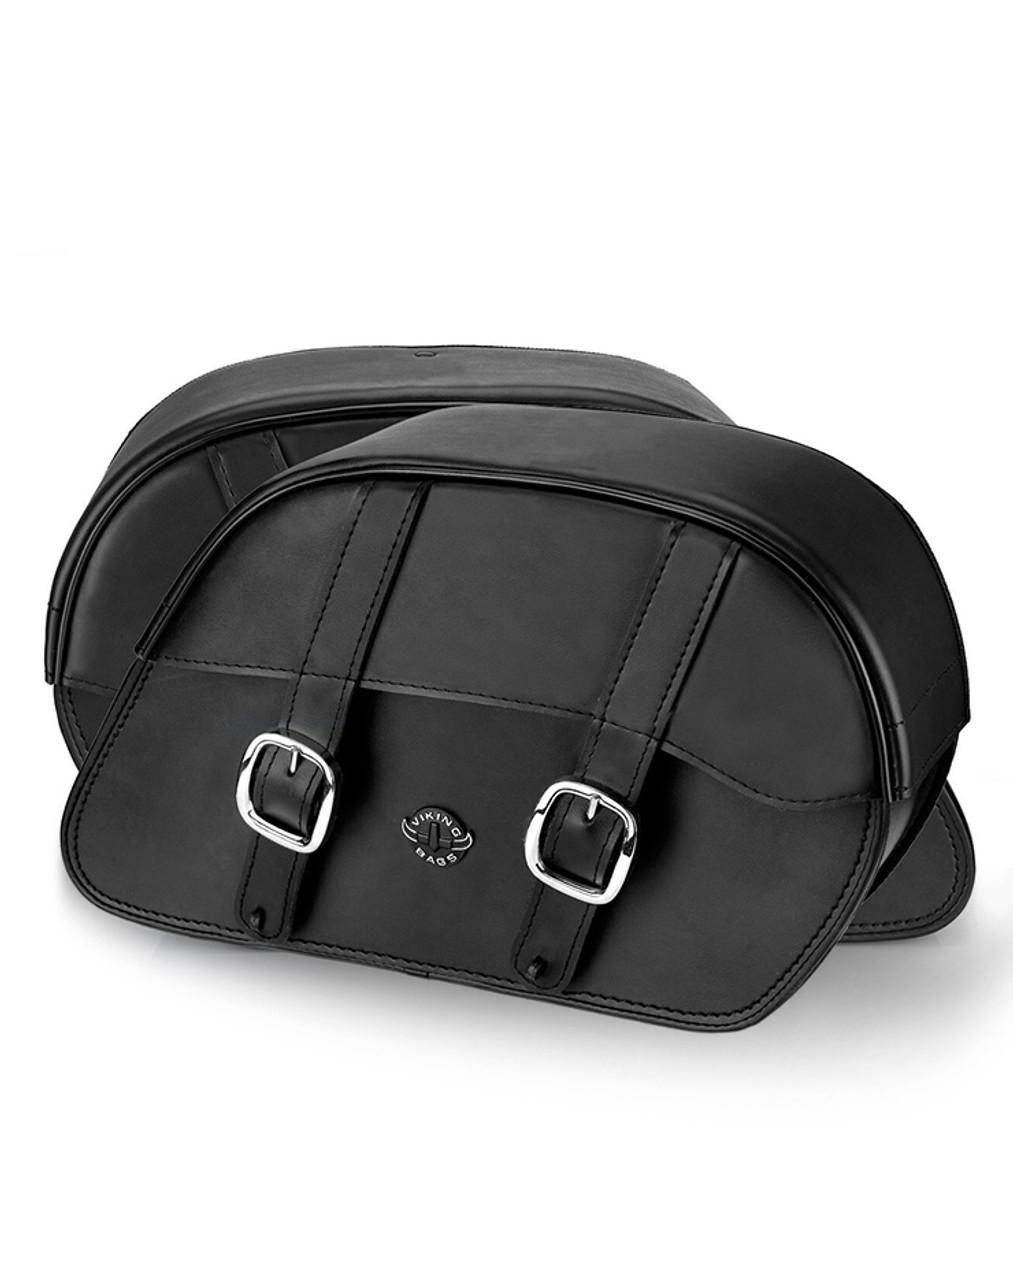 VikingBags Vital Medium Padlock Double Strap Leather Motorcycle Saddlebags Both Bags View